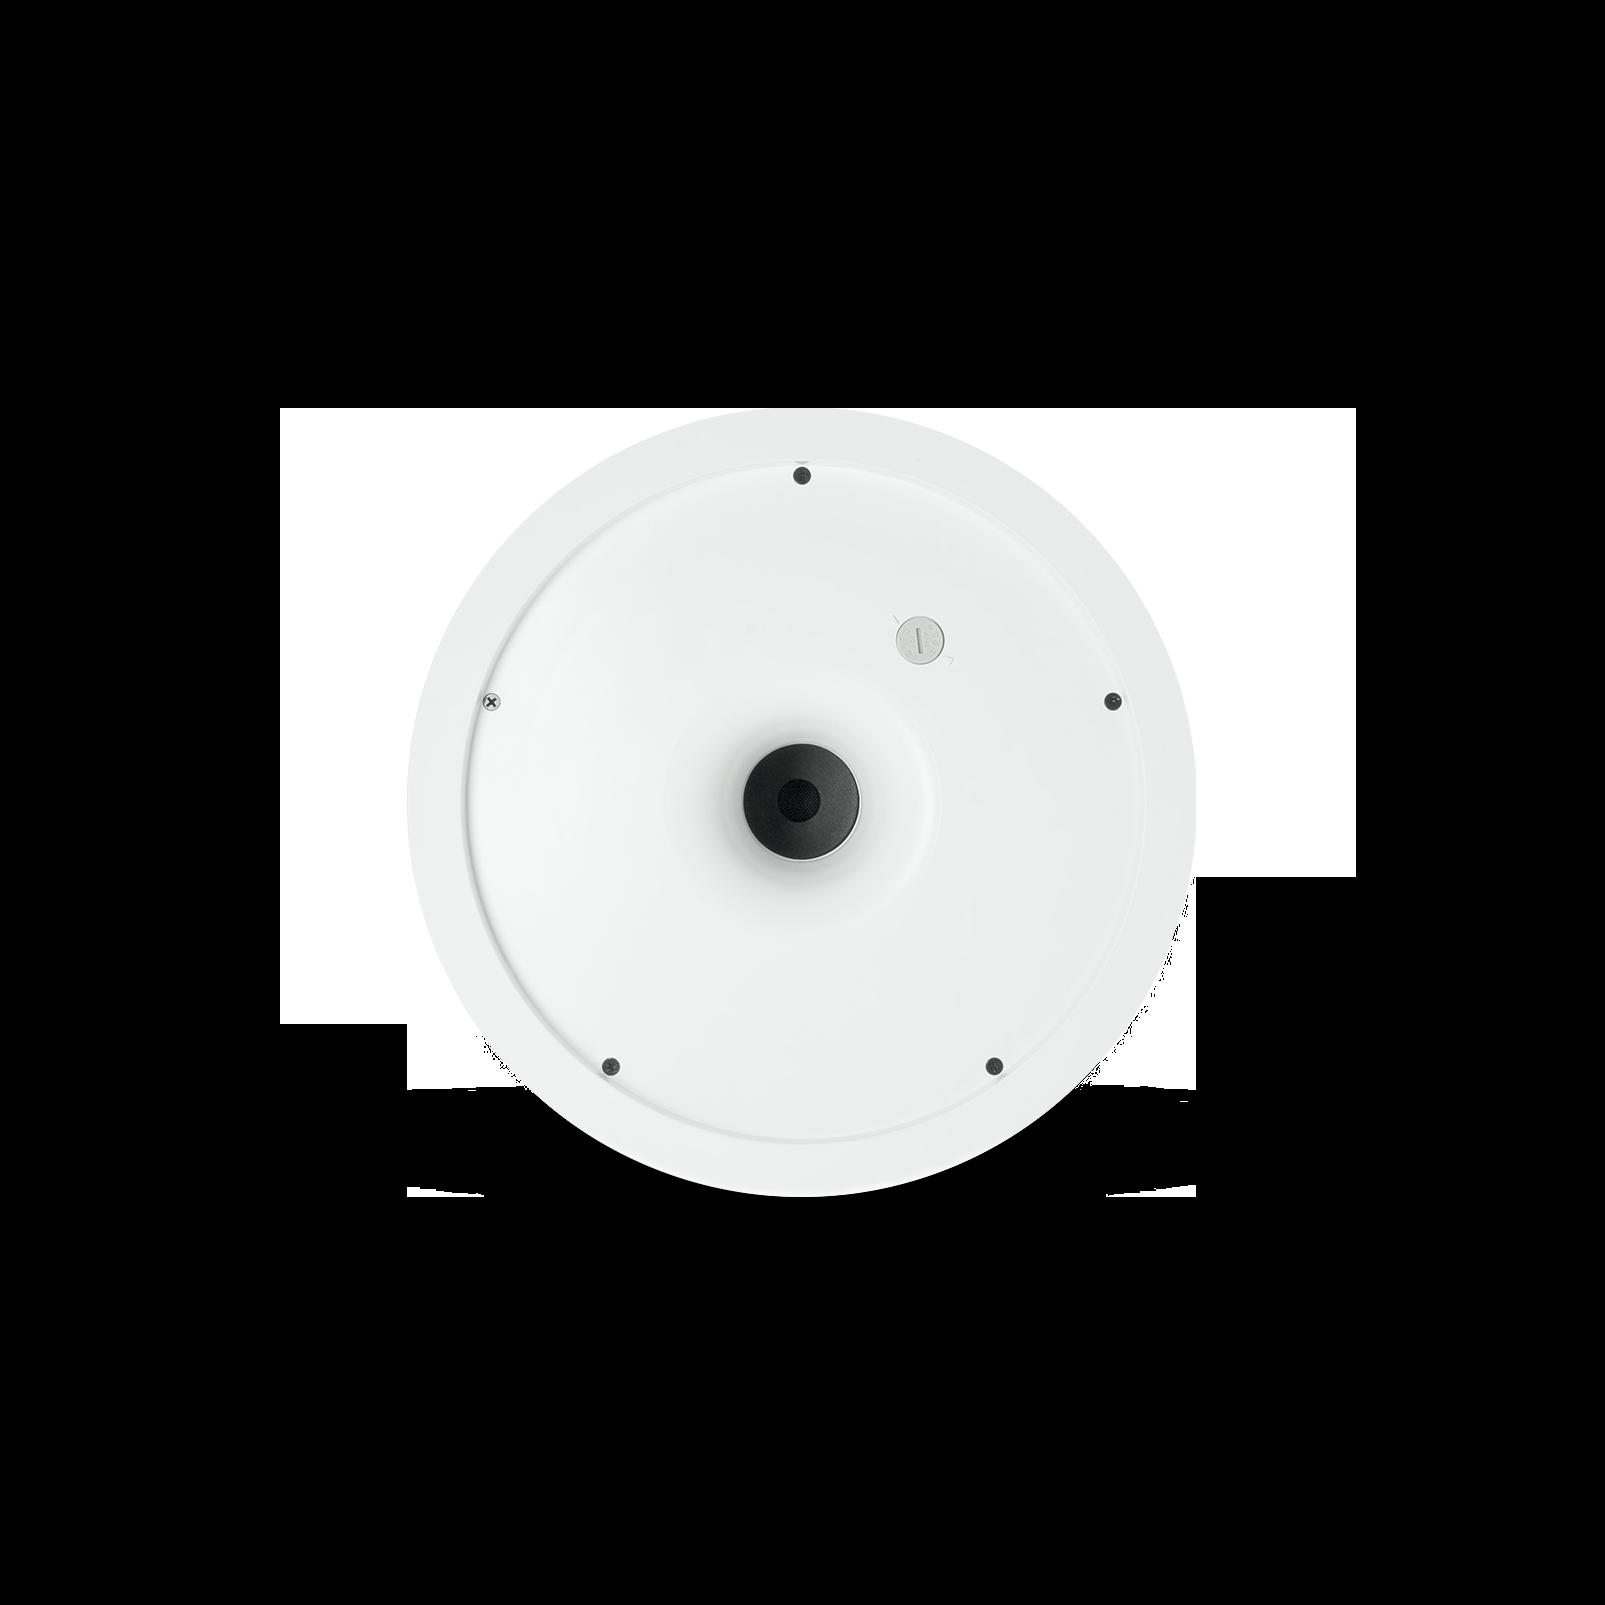 JBL Control 19CST (Pair) - White - In-Ceiling Subwoofer w/Multitap Transformer - Detailshot 1